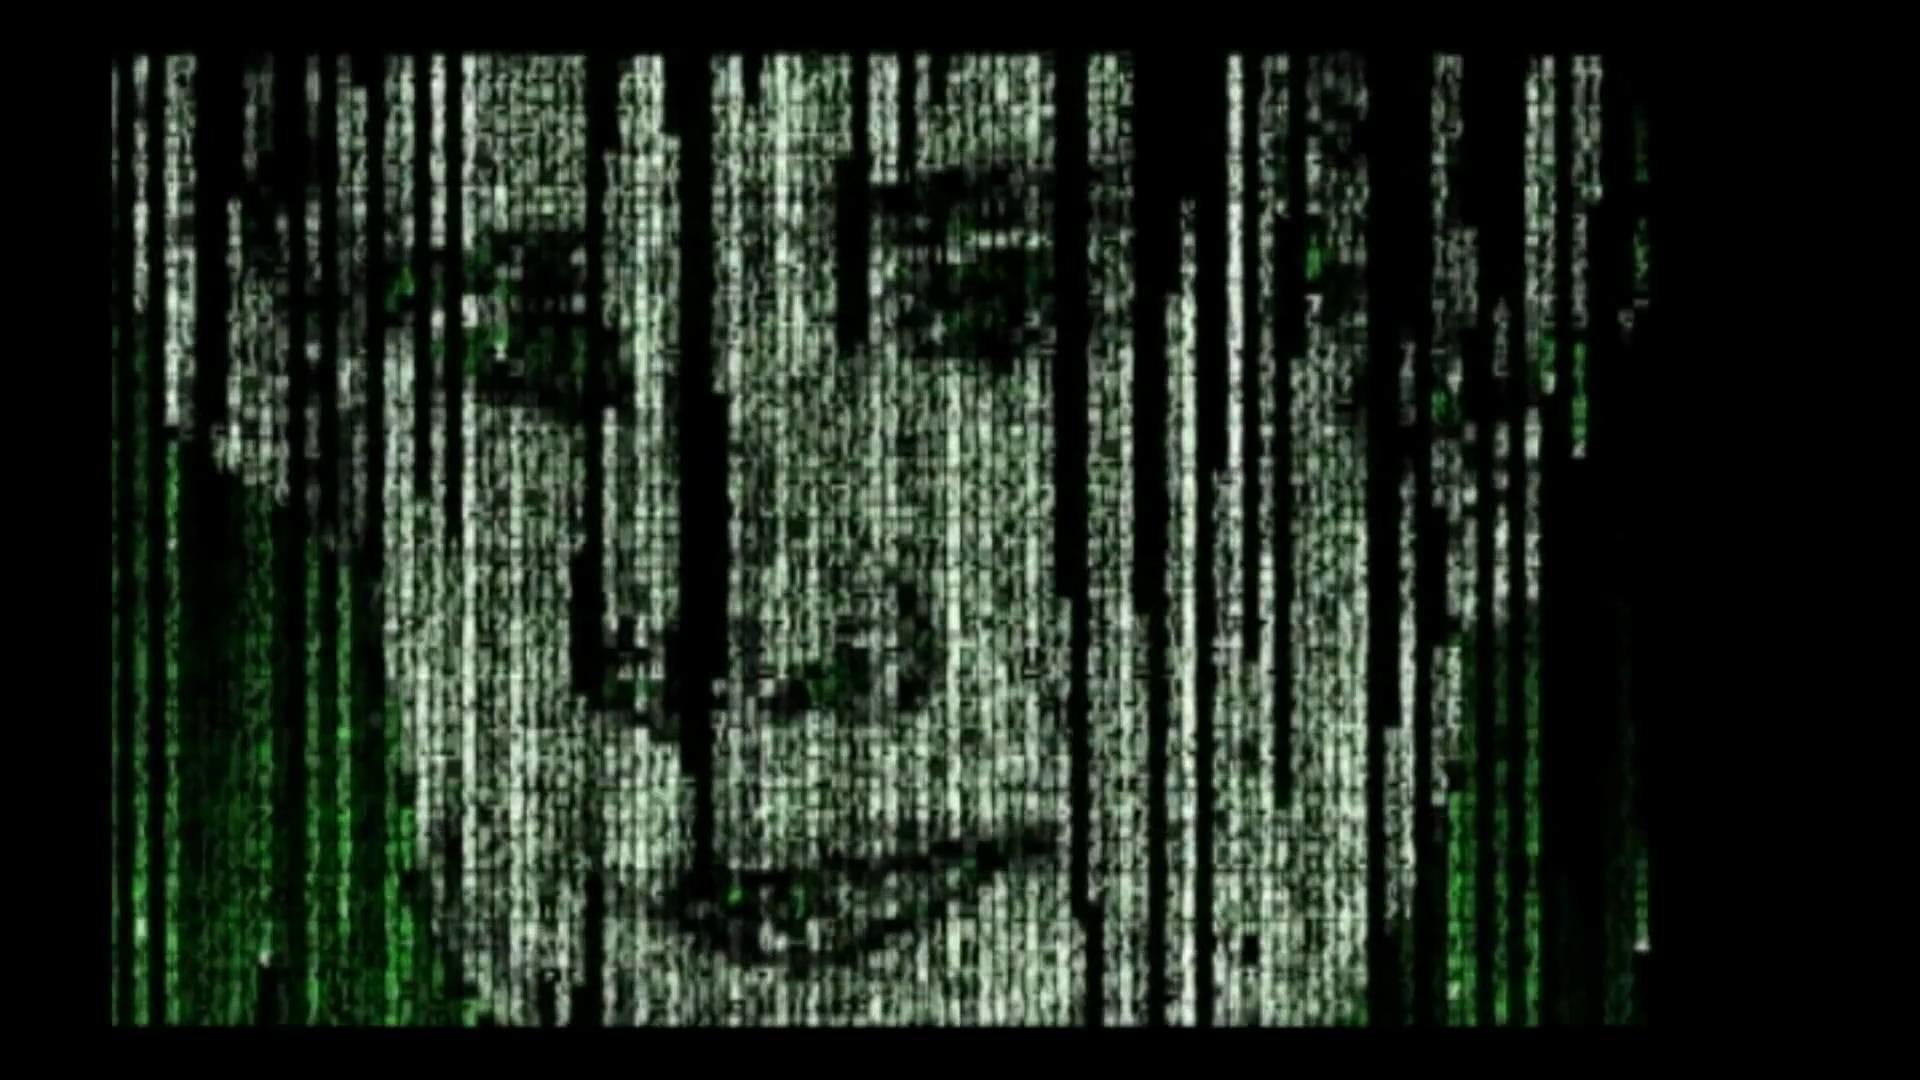 Matrix Rain Intro Effect Animation Code Digital C++ Part 1 of 2